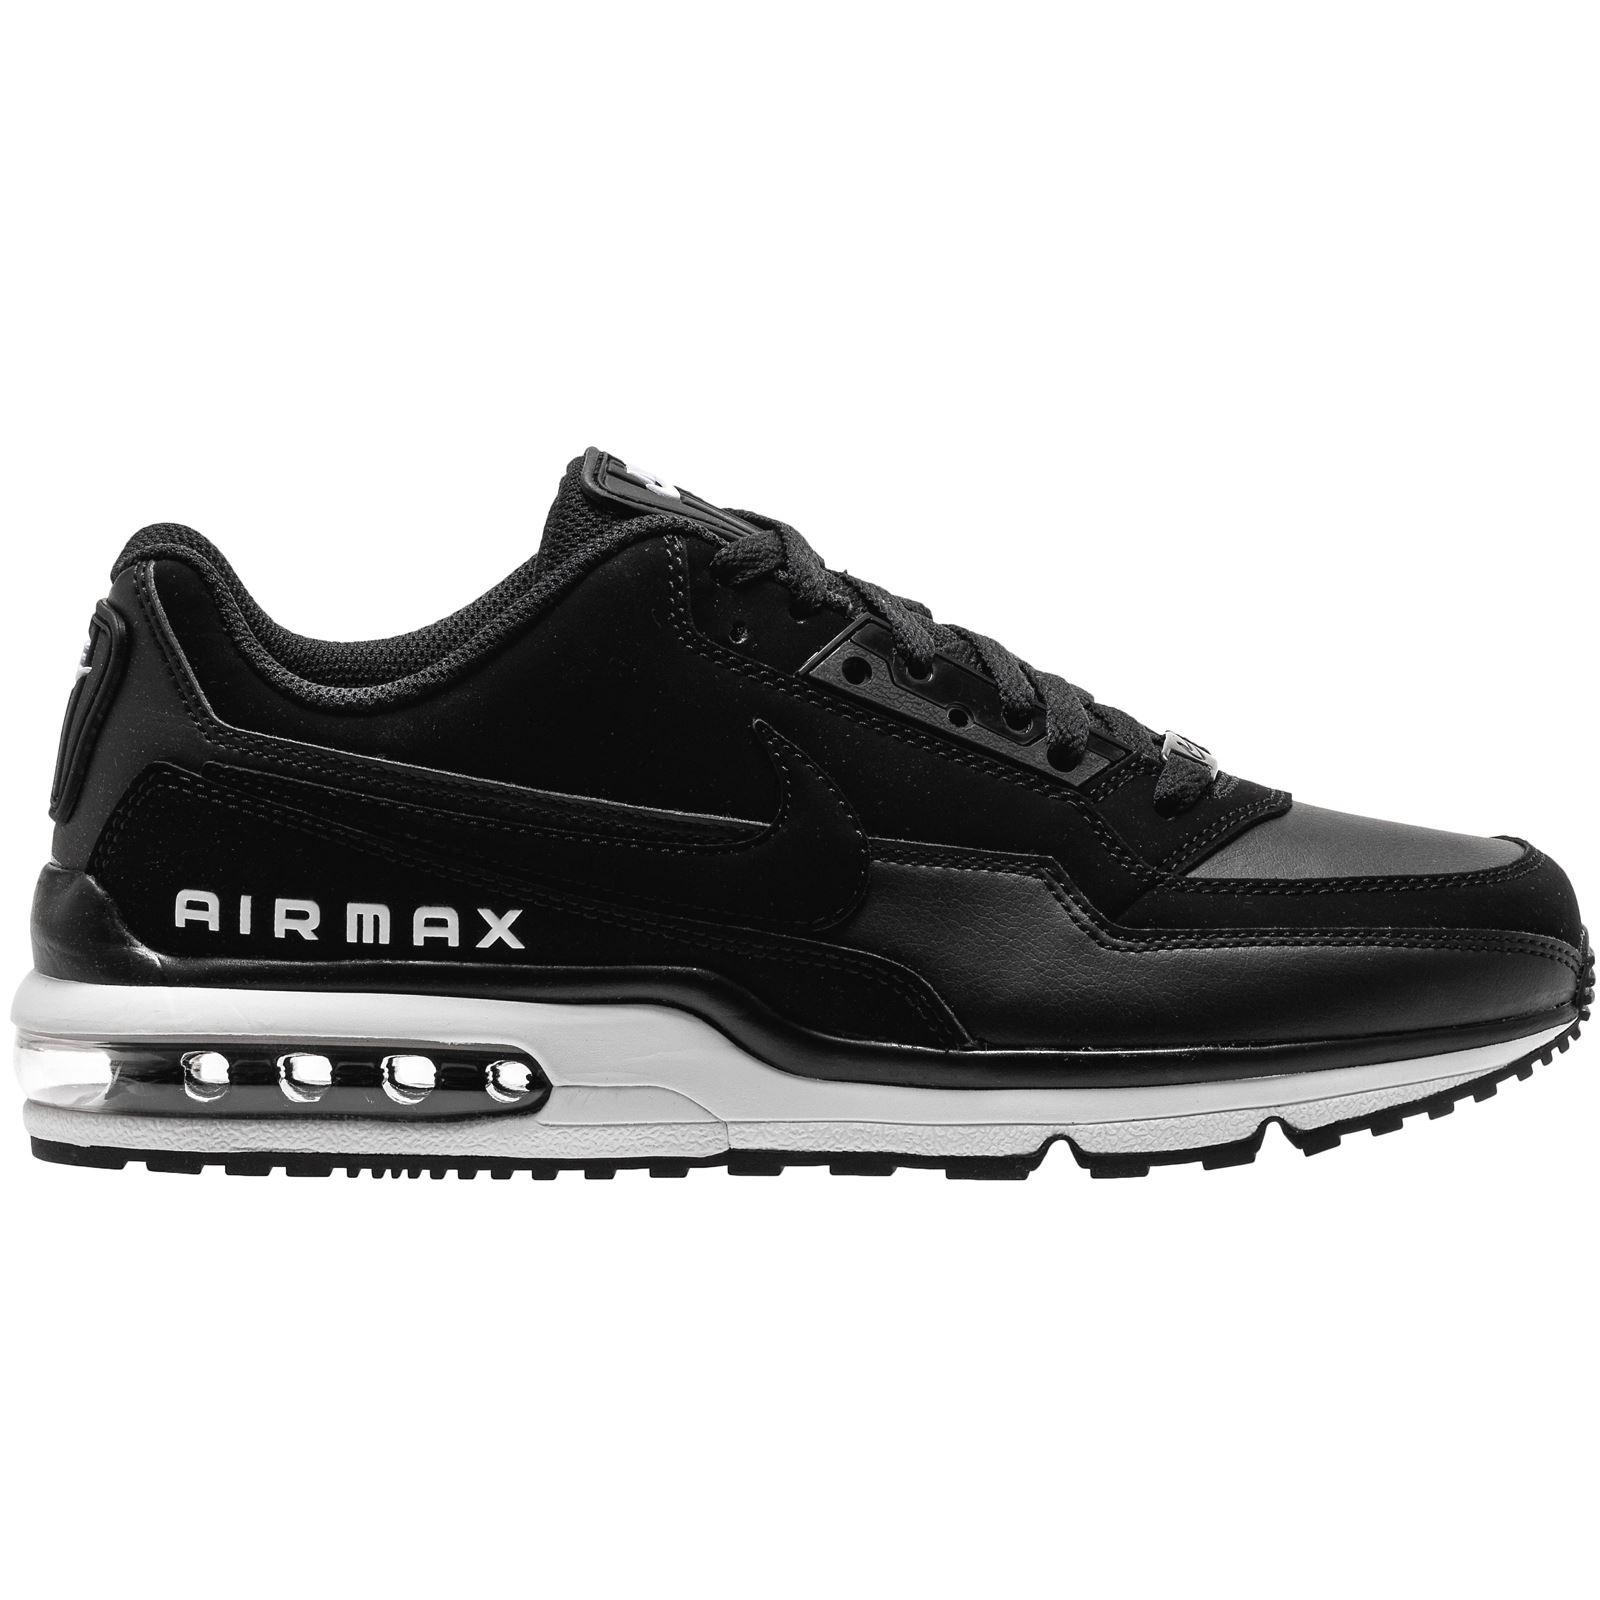 Description: The black Nike Air Max LTD 3 men's trainers ...